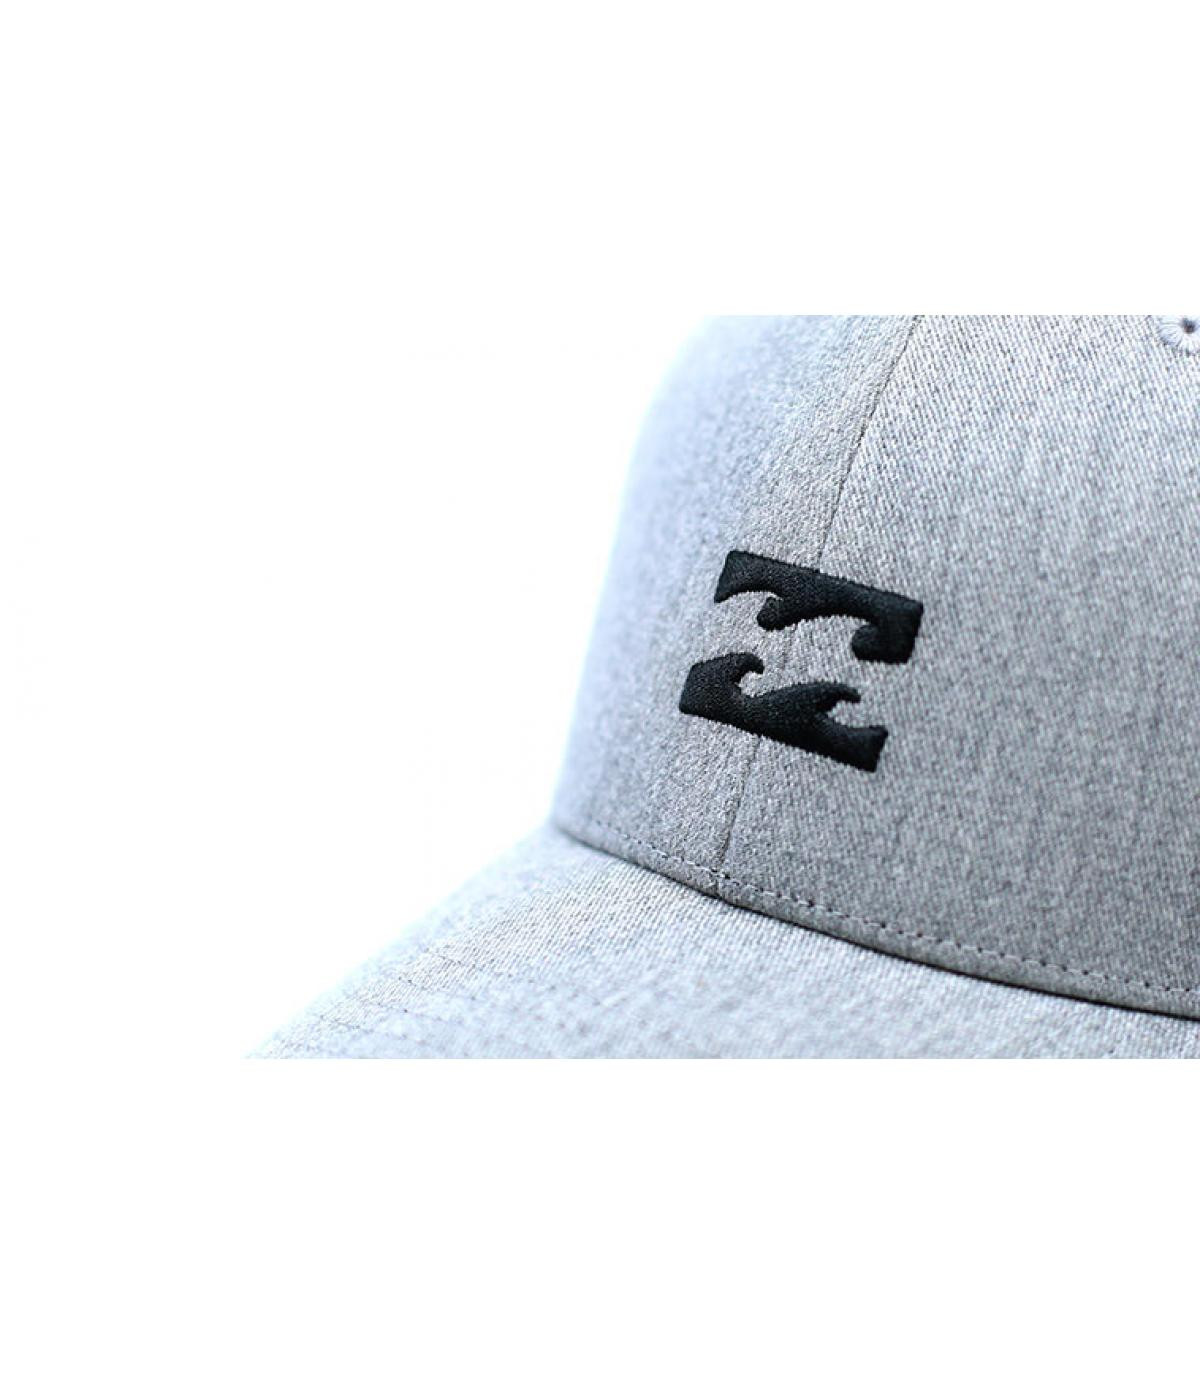 7a2d037d4 All Night Snapback heather grey